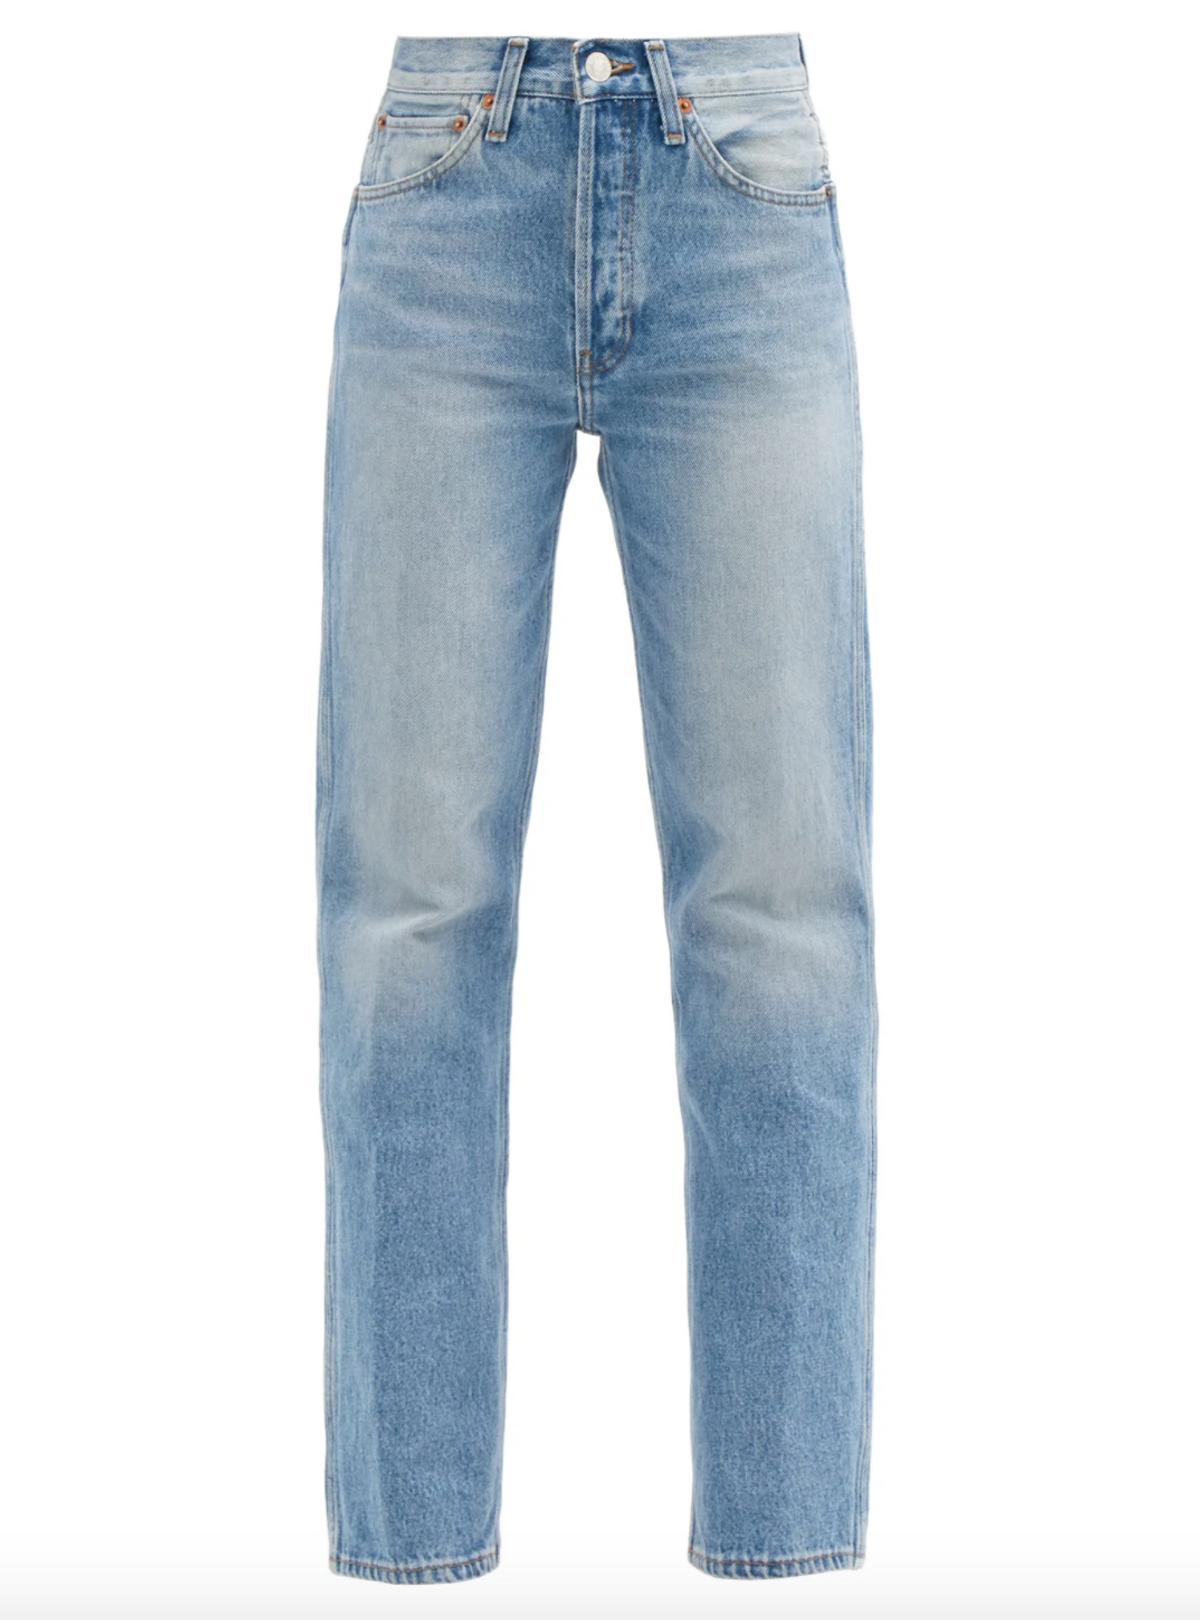 90s High-Rise Straight Leg Jeans